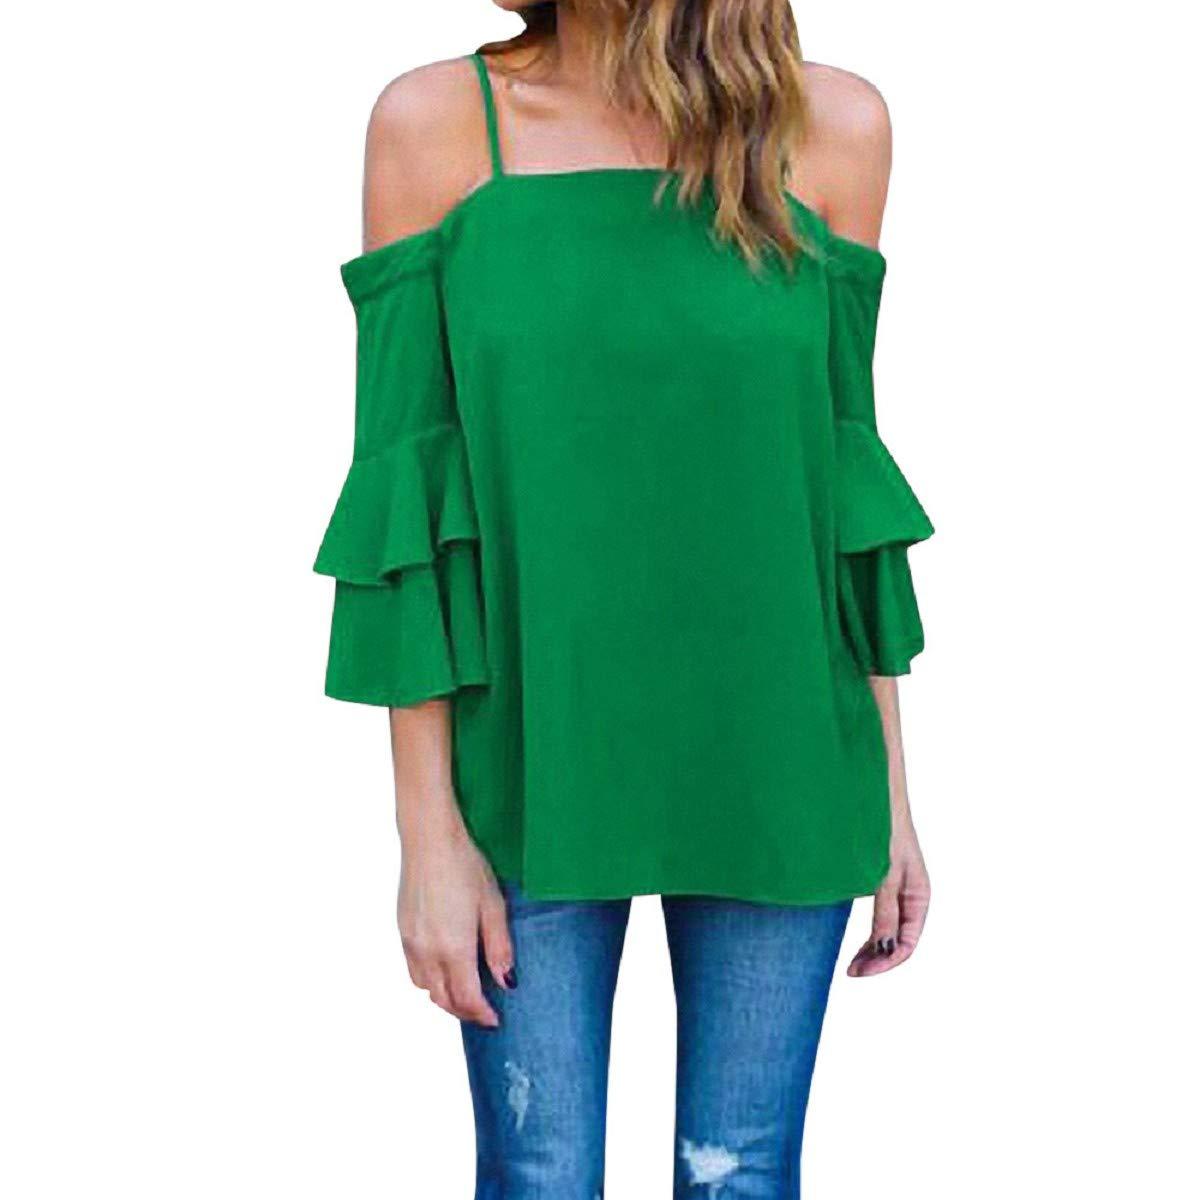 OTINICE Women Chiffon Blouse Off Shoulder Tank Top Ruffle Bell Sleeve Loose Casual Shirts Green